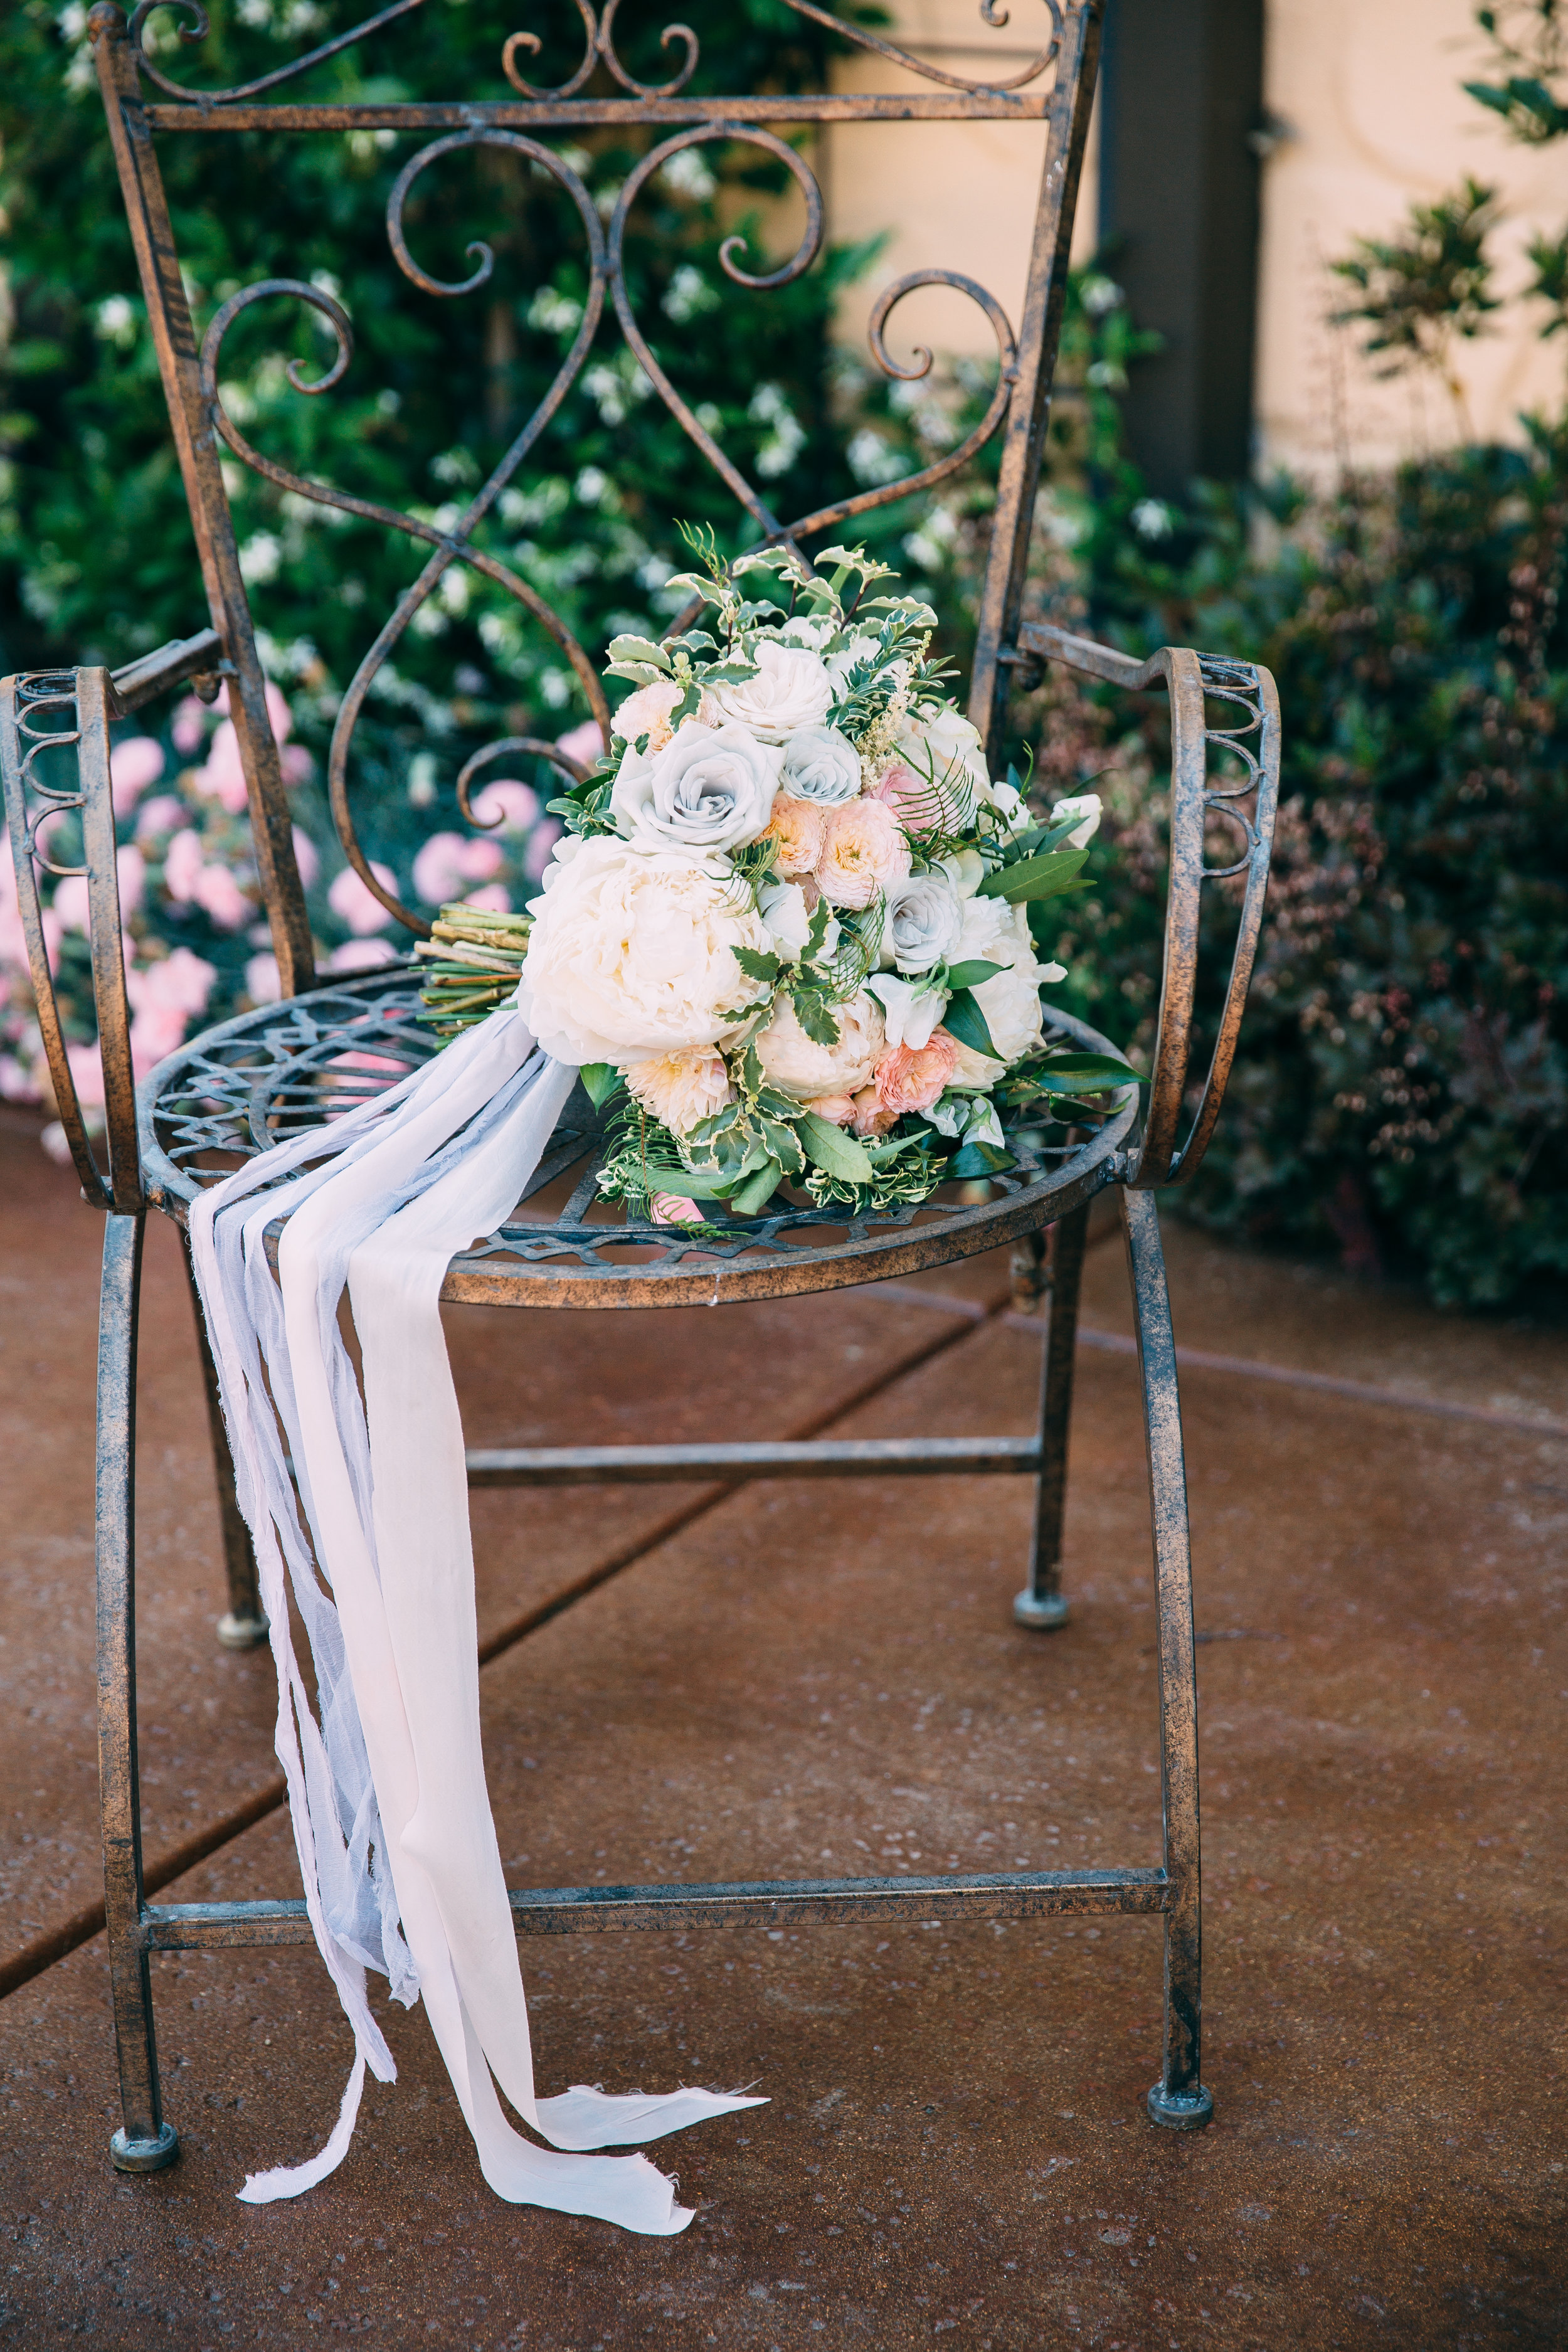 Violette-fleurs-anna-perevertaylo-White-Blush-elegant-flowers-for-wedding-decor-upscale-design-roseville-sacramento-california-rancho-robles-vinyards-lincoln-elegant-luxury-blush-bridal-bouquet-flowing-long-silk-ribbon.jpg